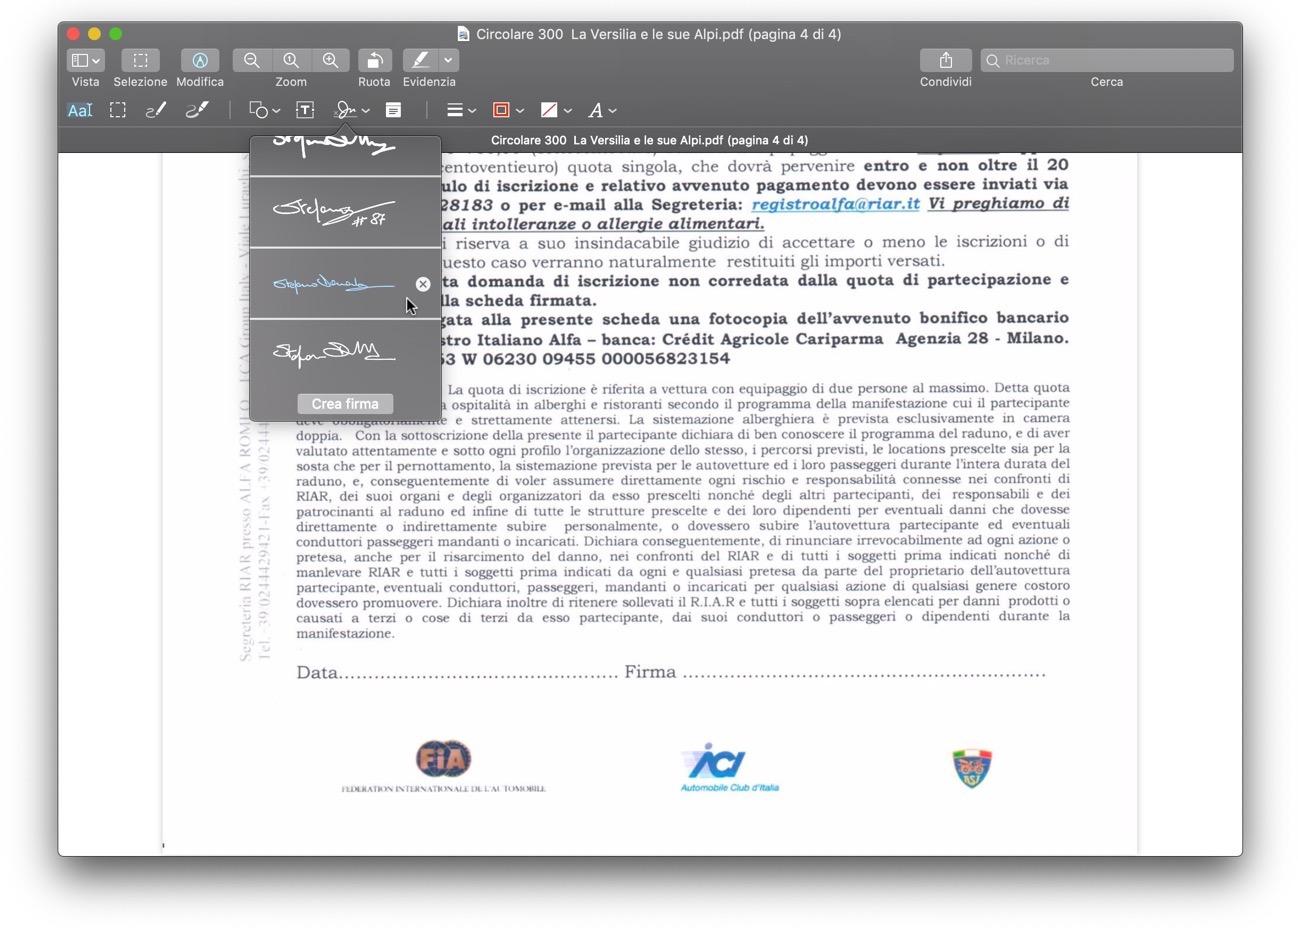 Firma Anteprima macOS catalina